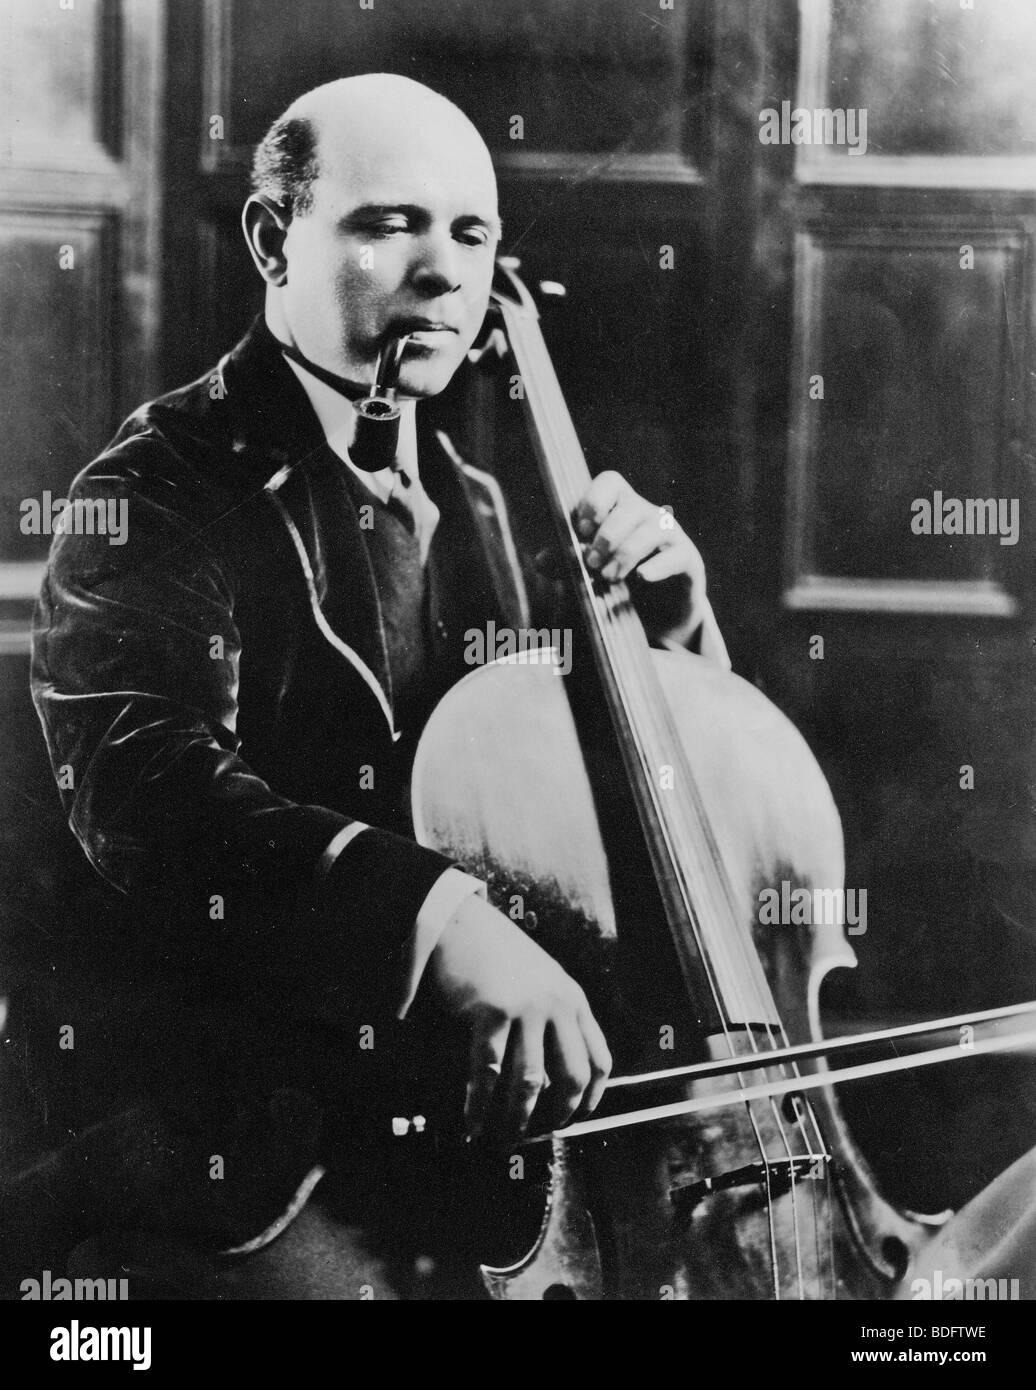 pablo casals Pablo casals, tlahuac, distrito federal, mexico 11,909 likes pau casals i defilló, also known as pablo casals, was a cellist, composer, and conductor.